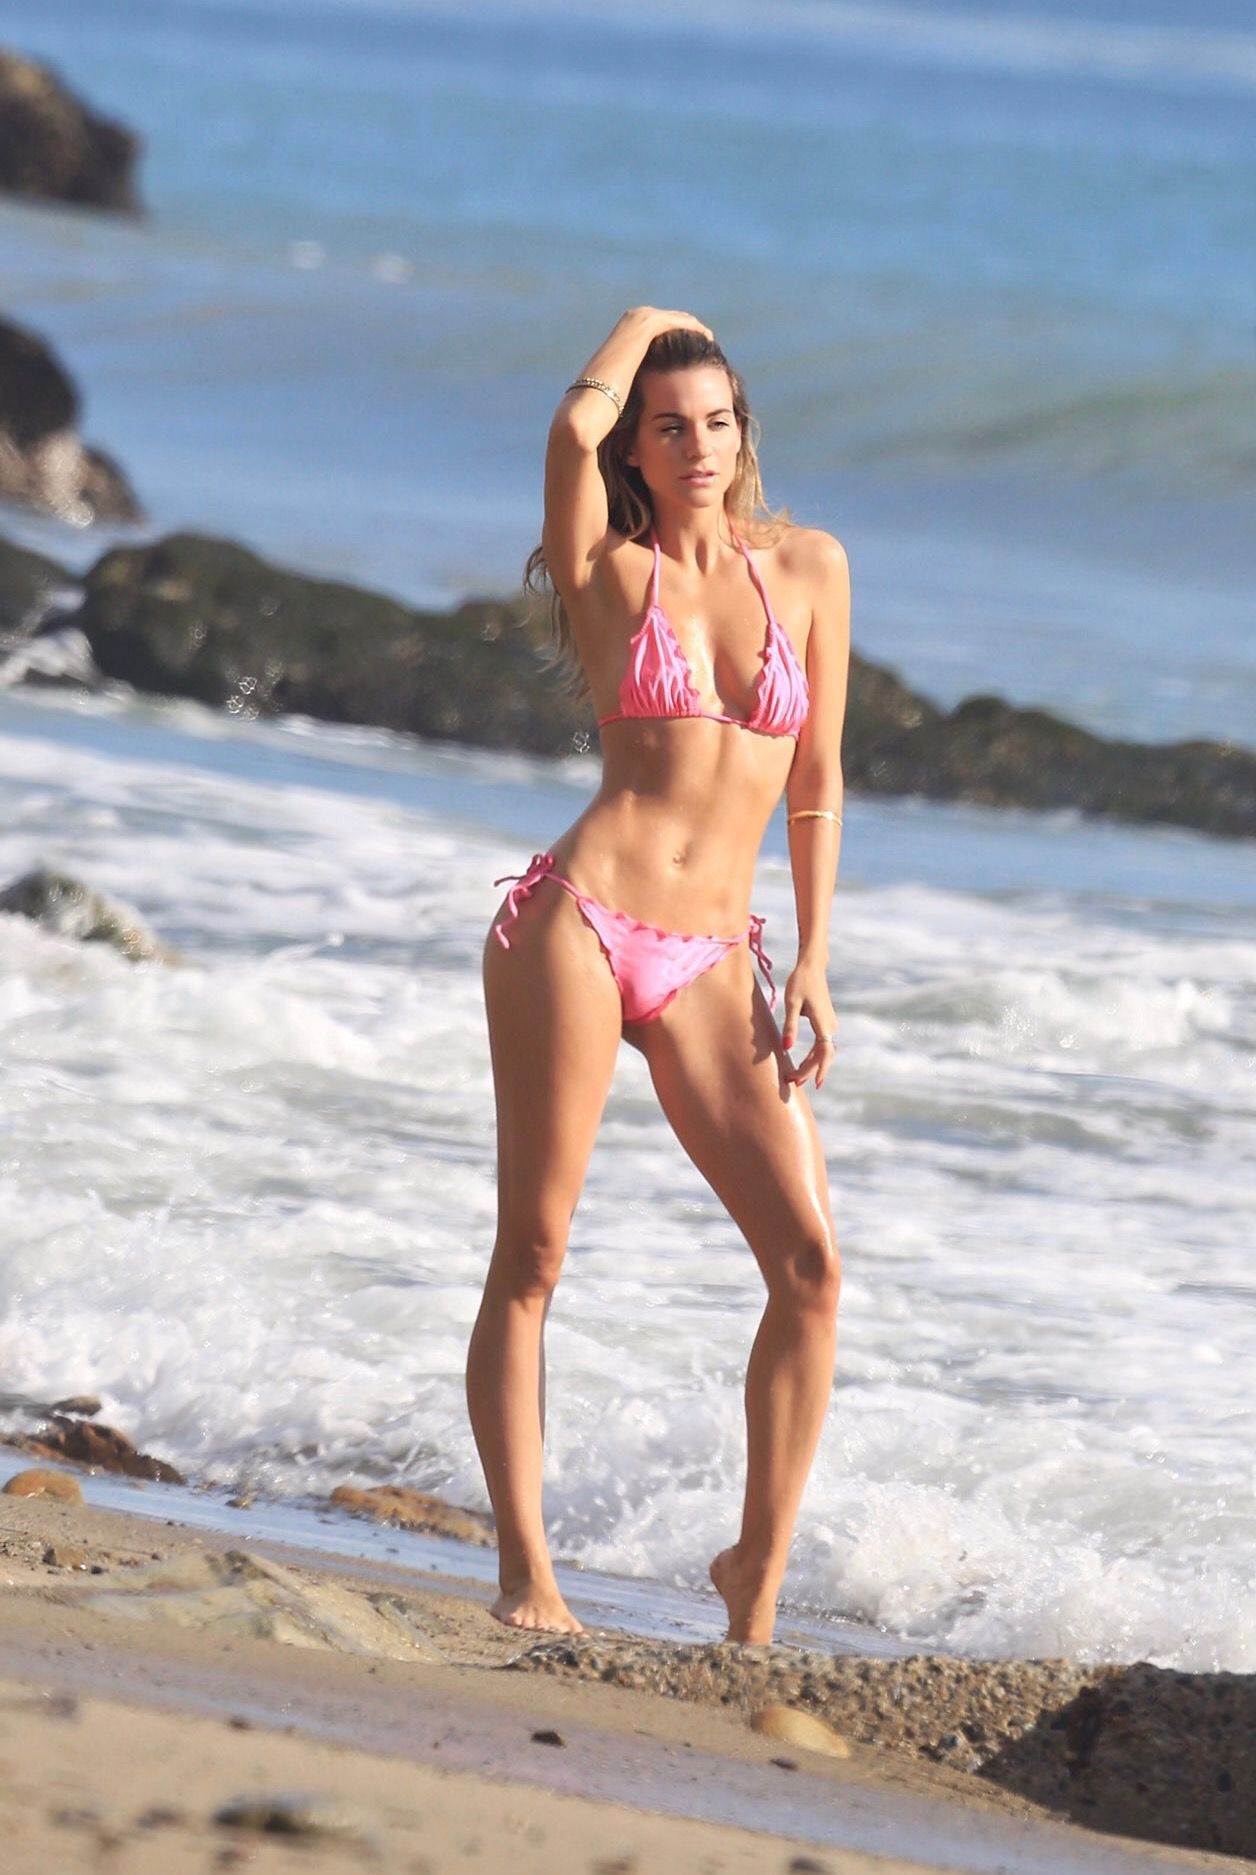 2019 Rachel McCord nudes (41 photos), Sexy, Leaked, Selfie, swimsuit 2006